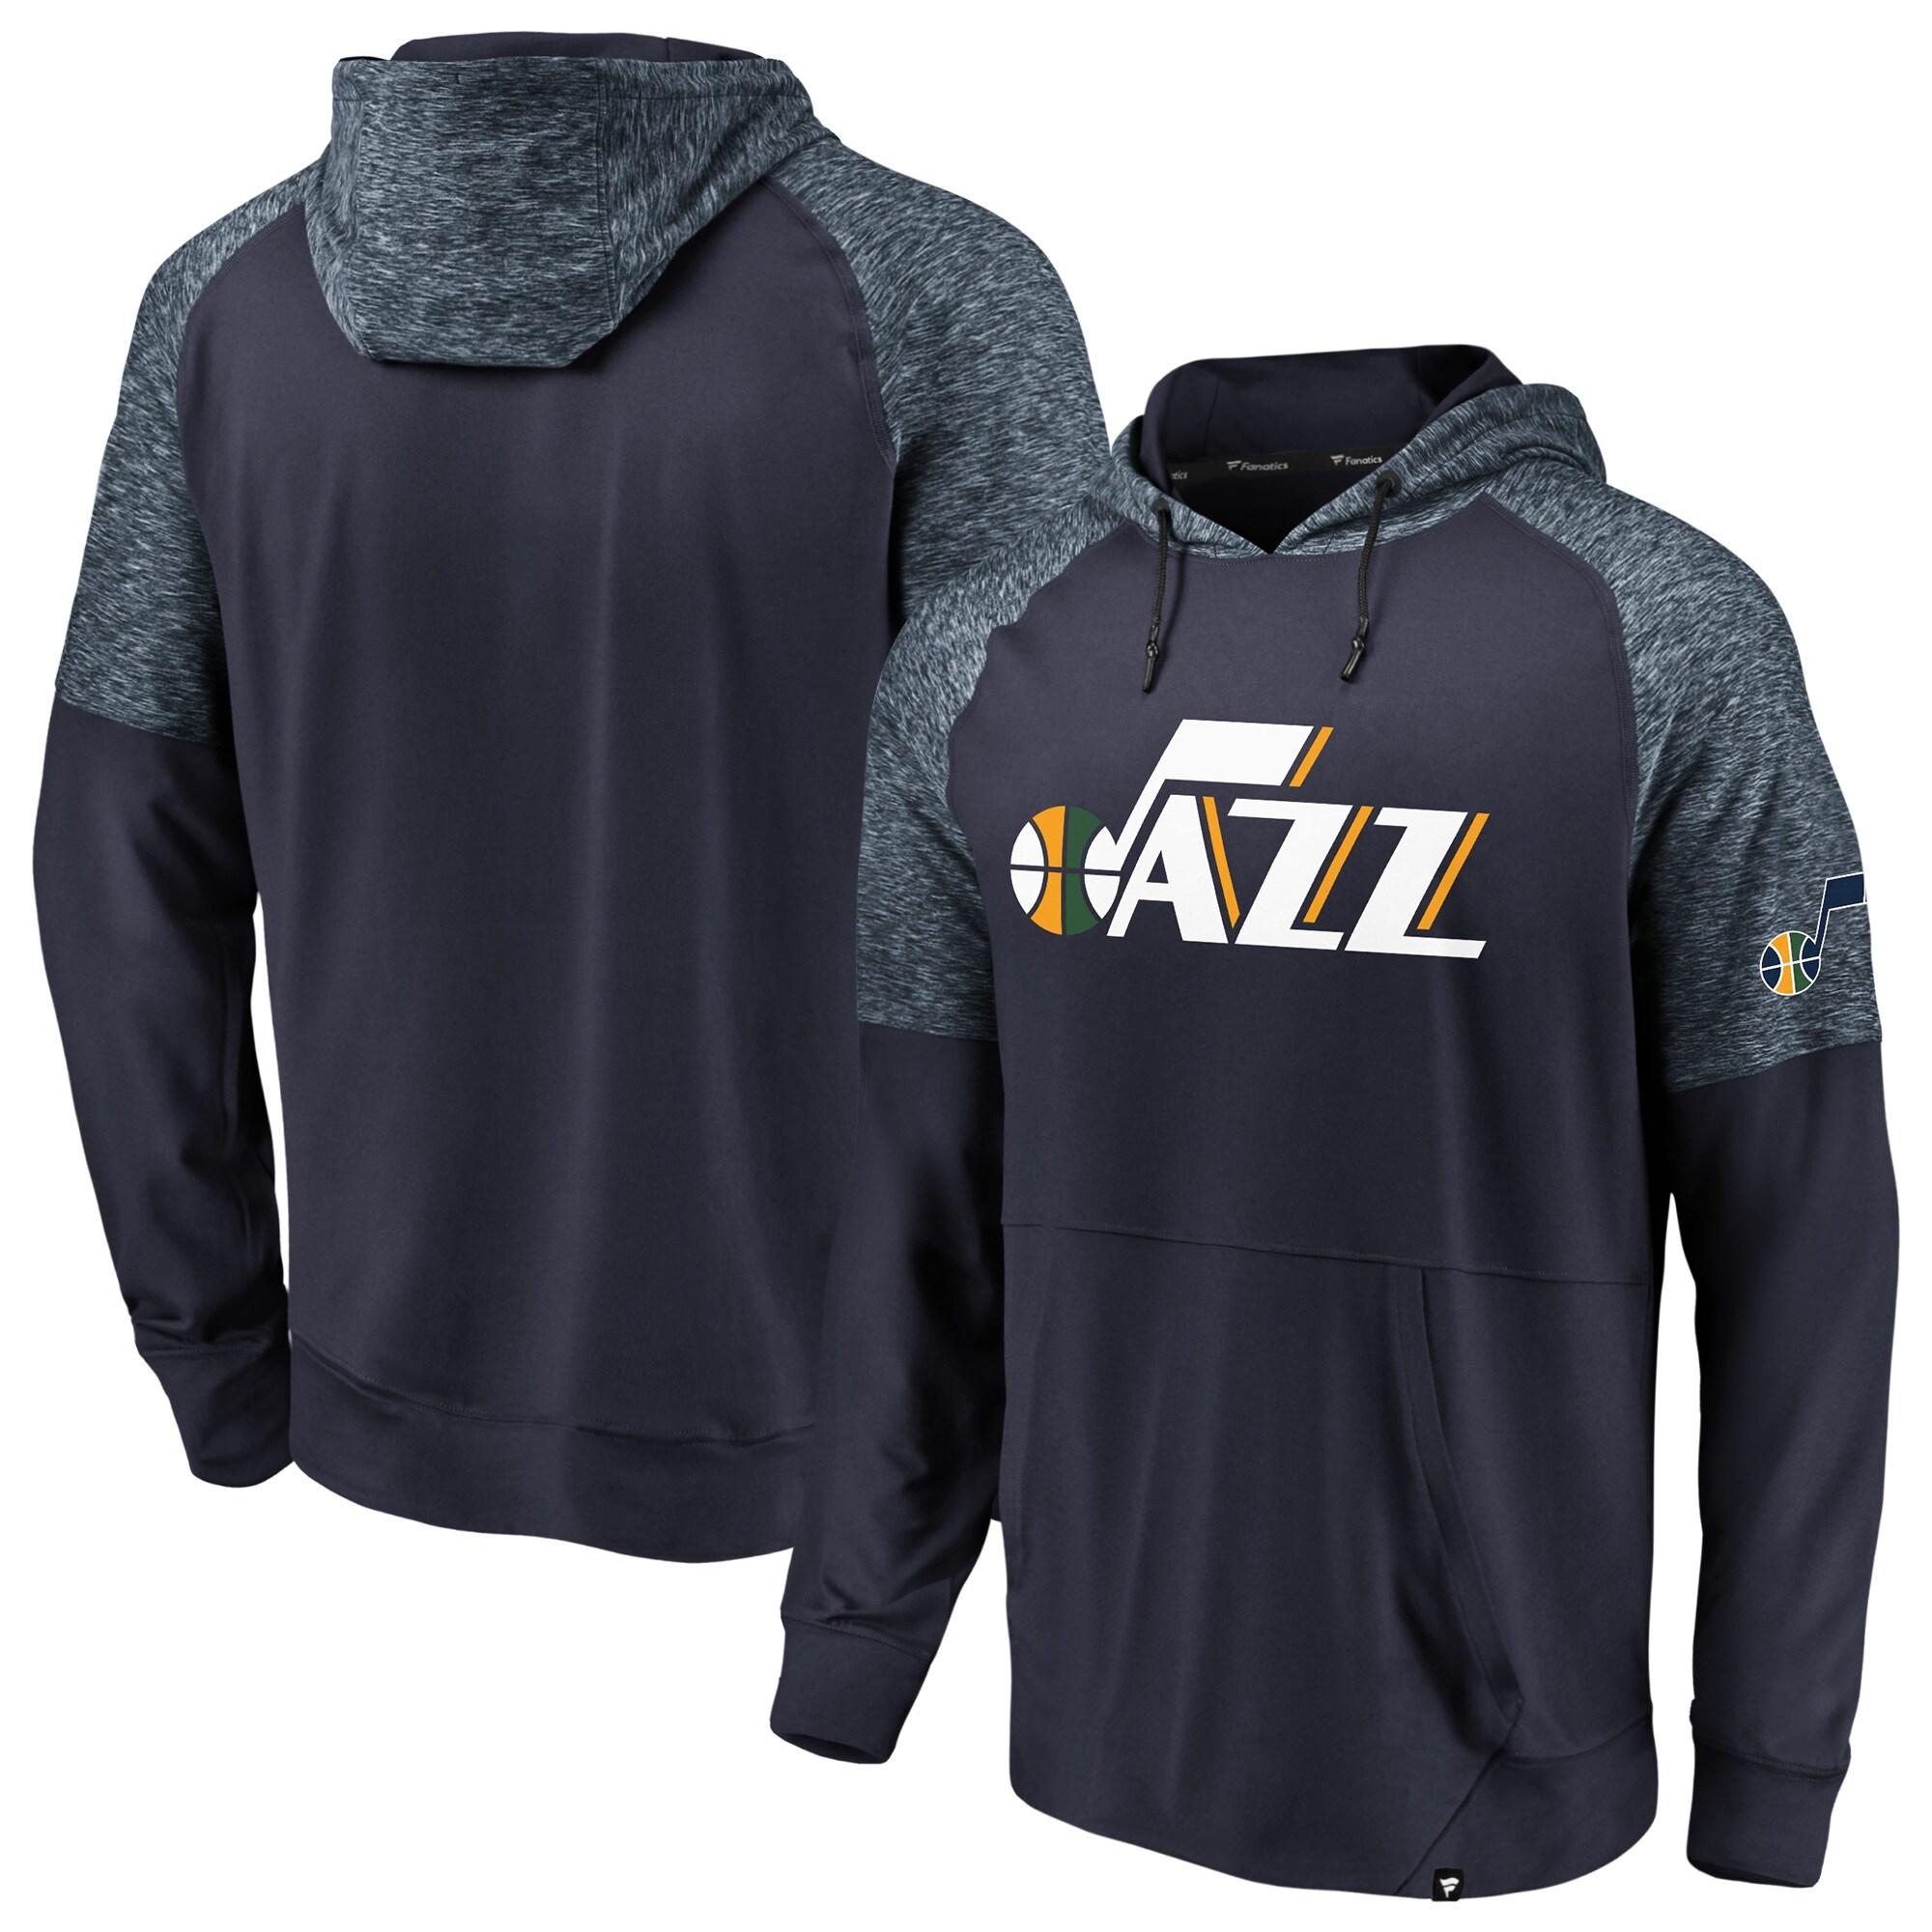 Utah Jazz Fanatics Branded Made to Move Static Performance Raglan Pullover Hoodie - Navy